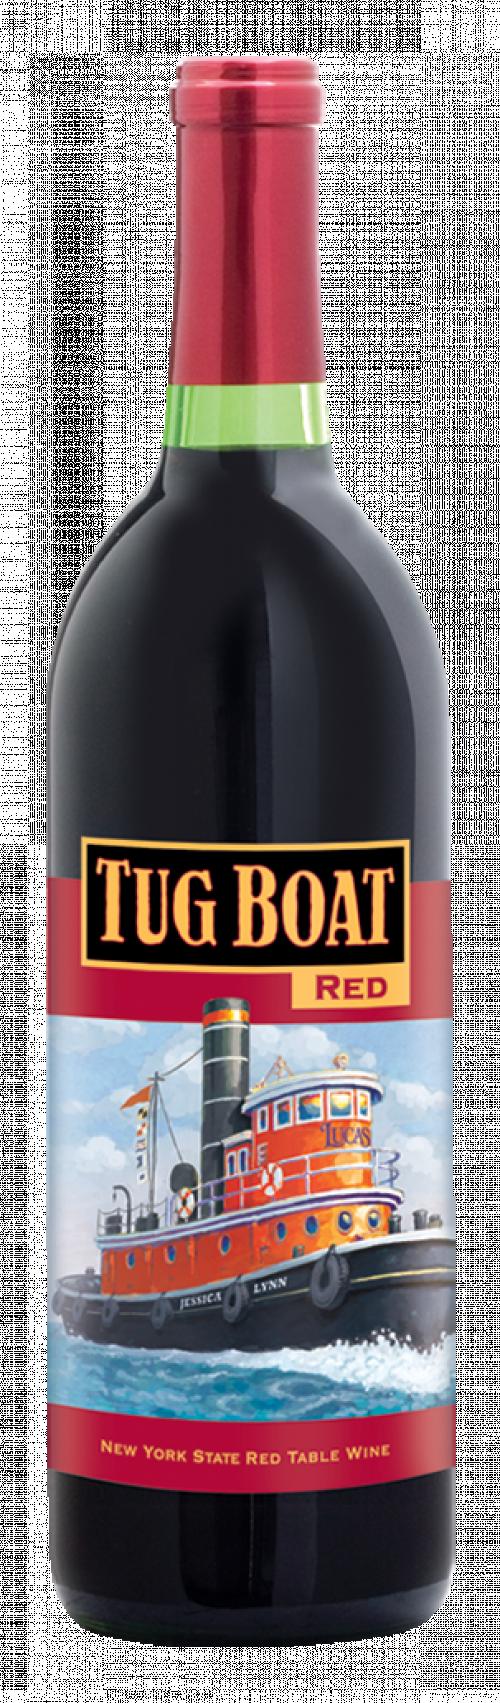 Lucas Tugboat Red 750ml NV